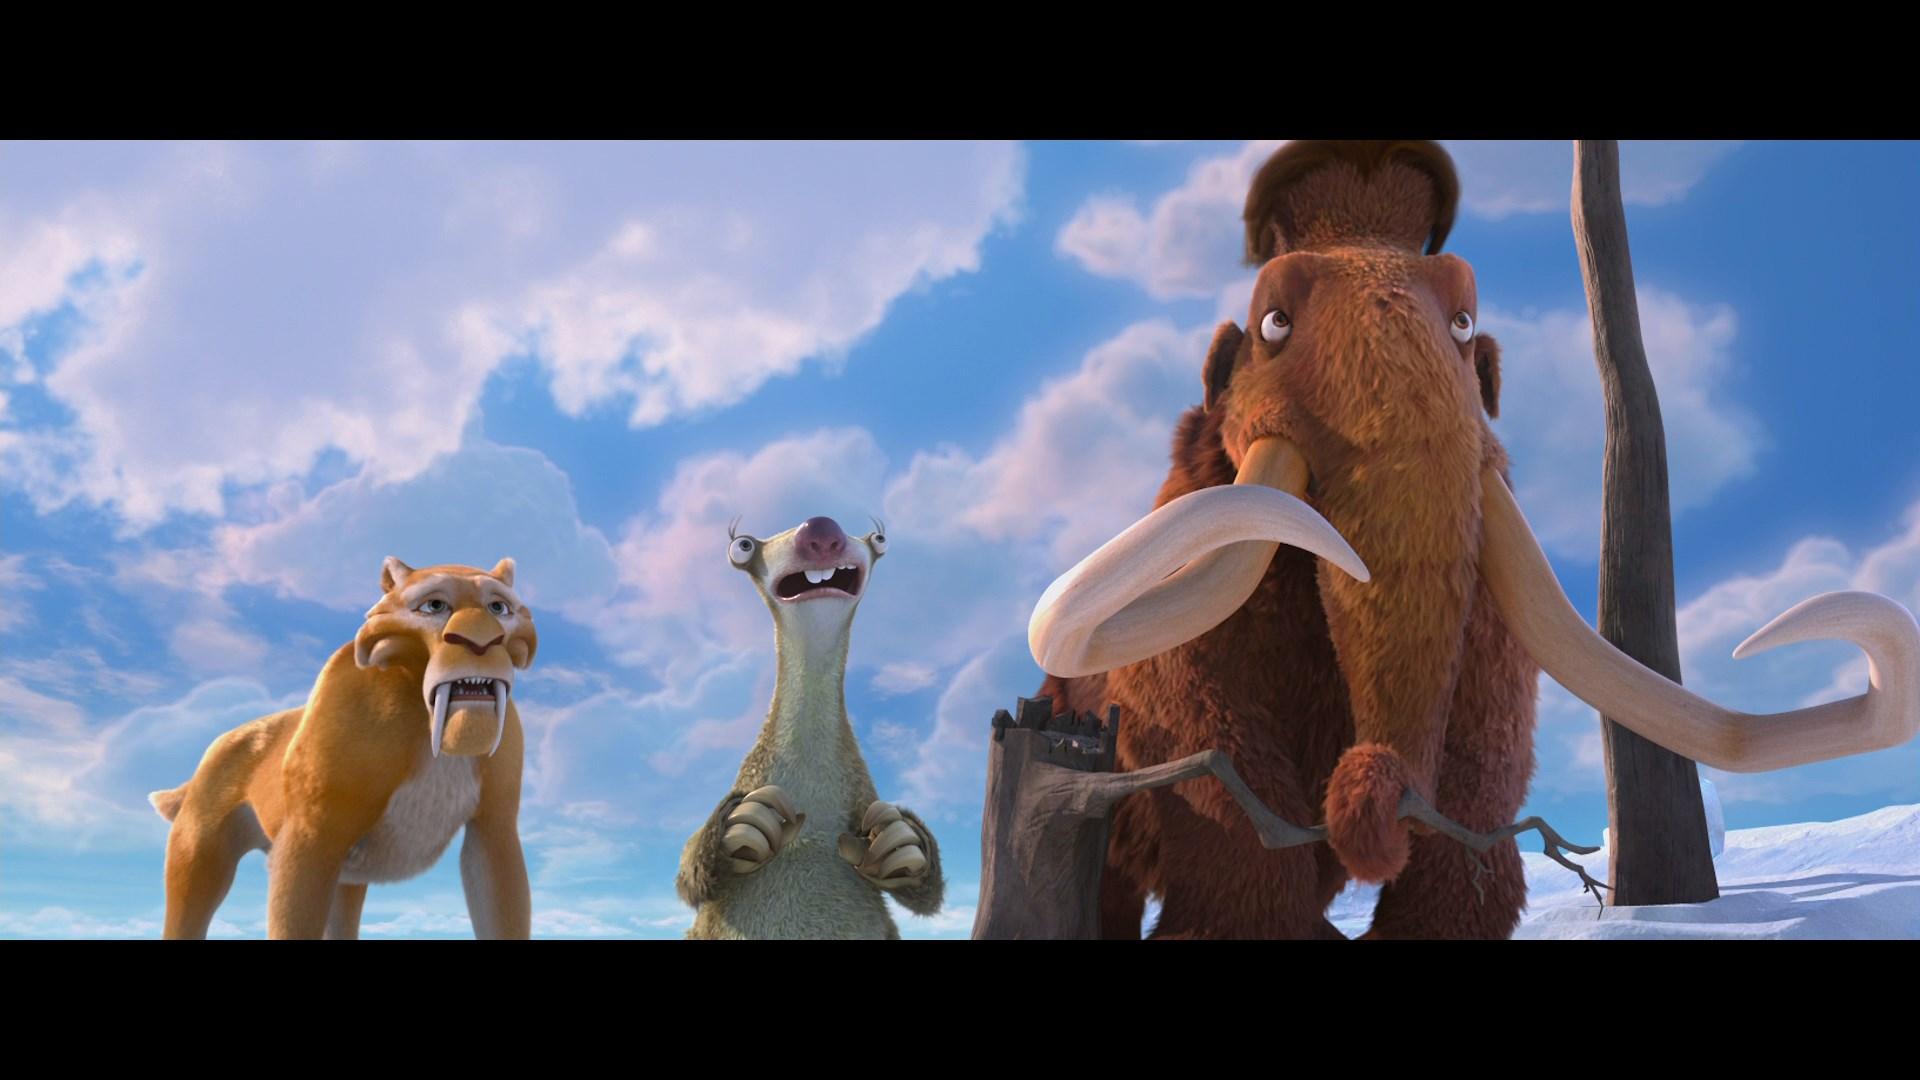 La era de hielo 4 (2012) 1080p Remux Latino